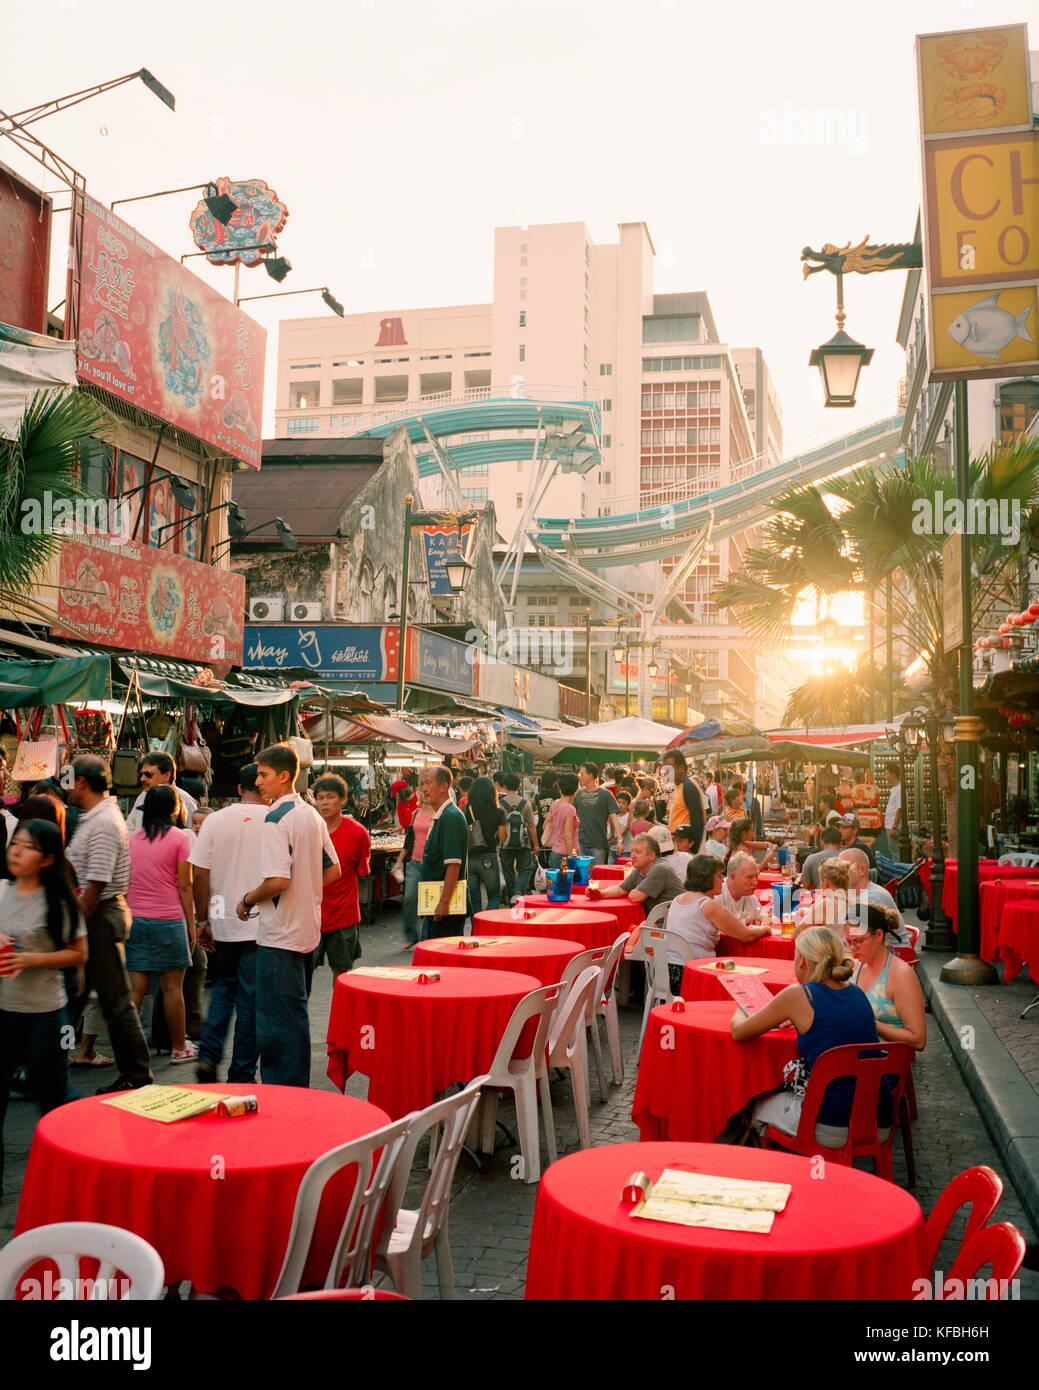 MALAYSIA, Kuala Lumpur, people eating food at street cafe in Chinatown - Stock Image